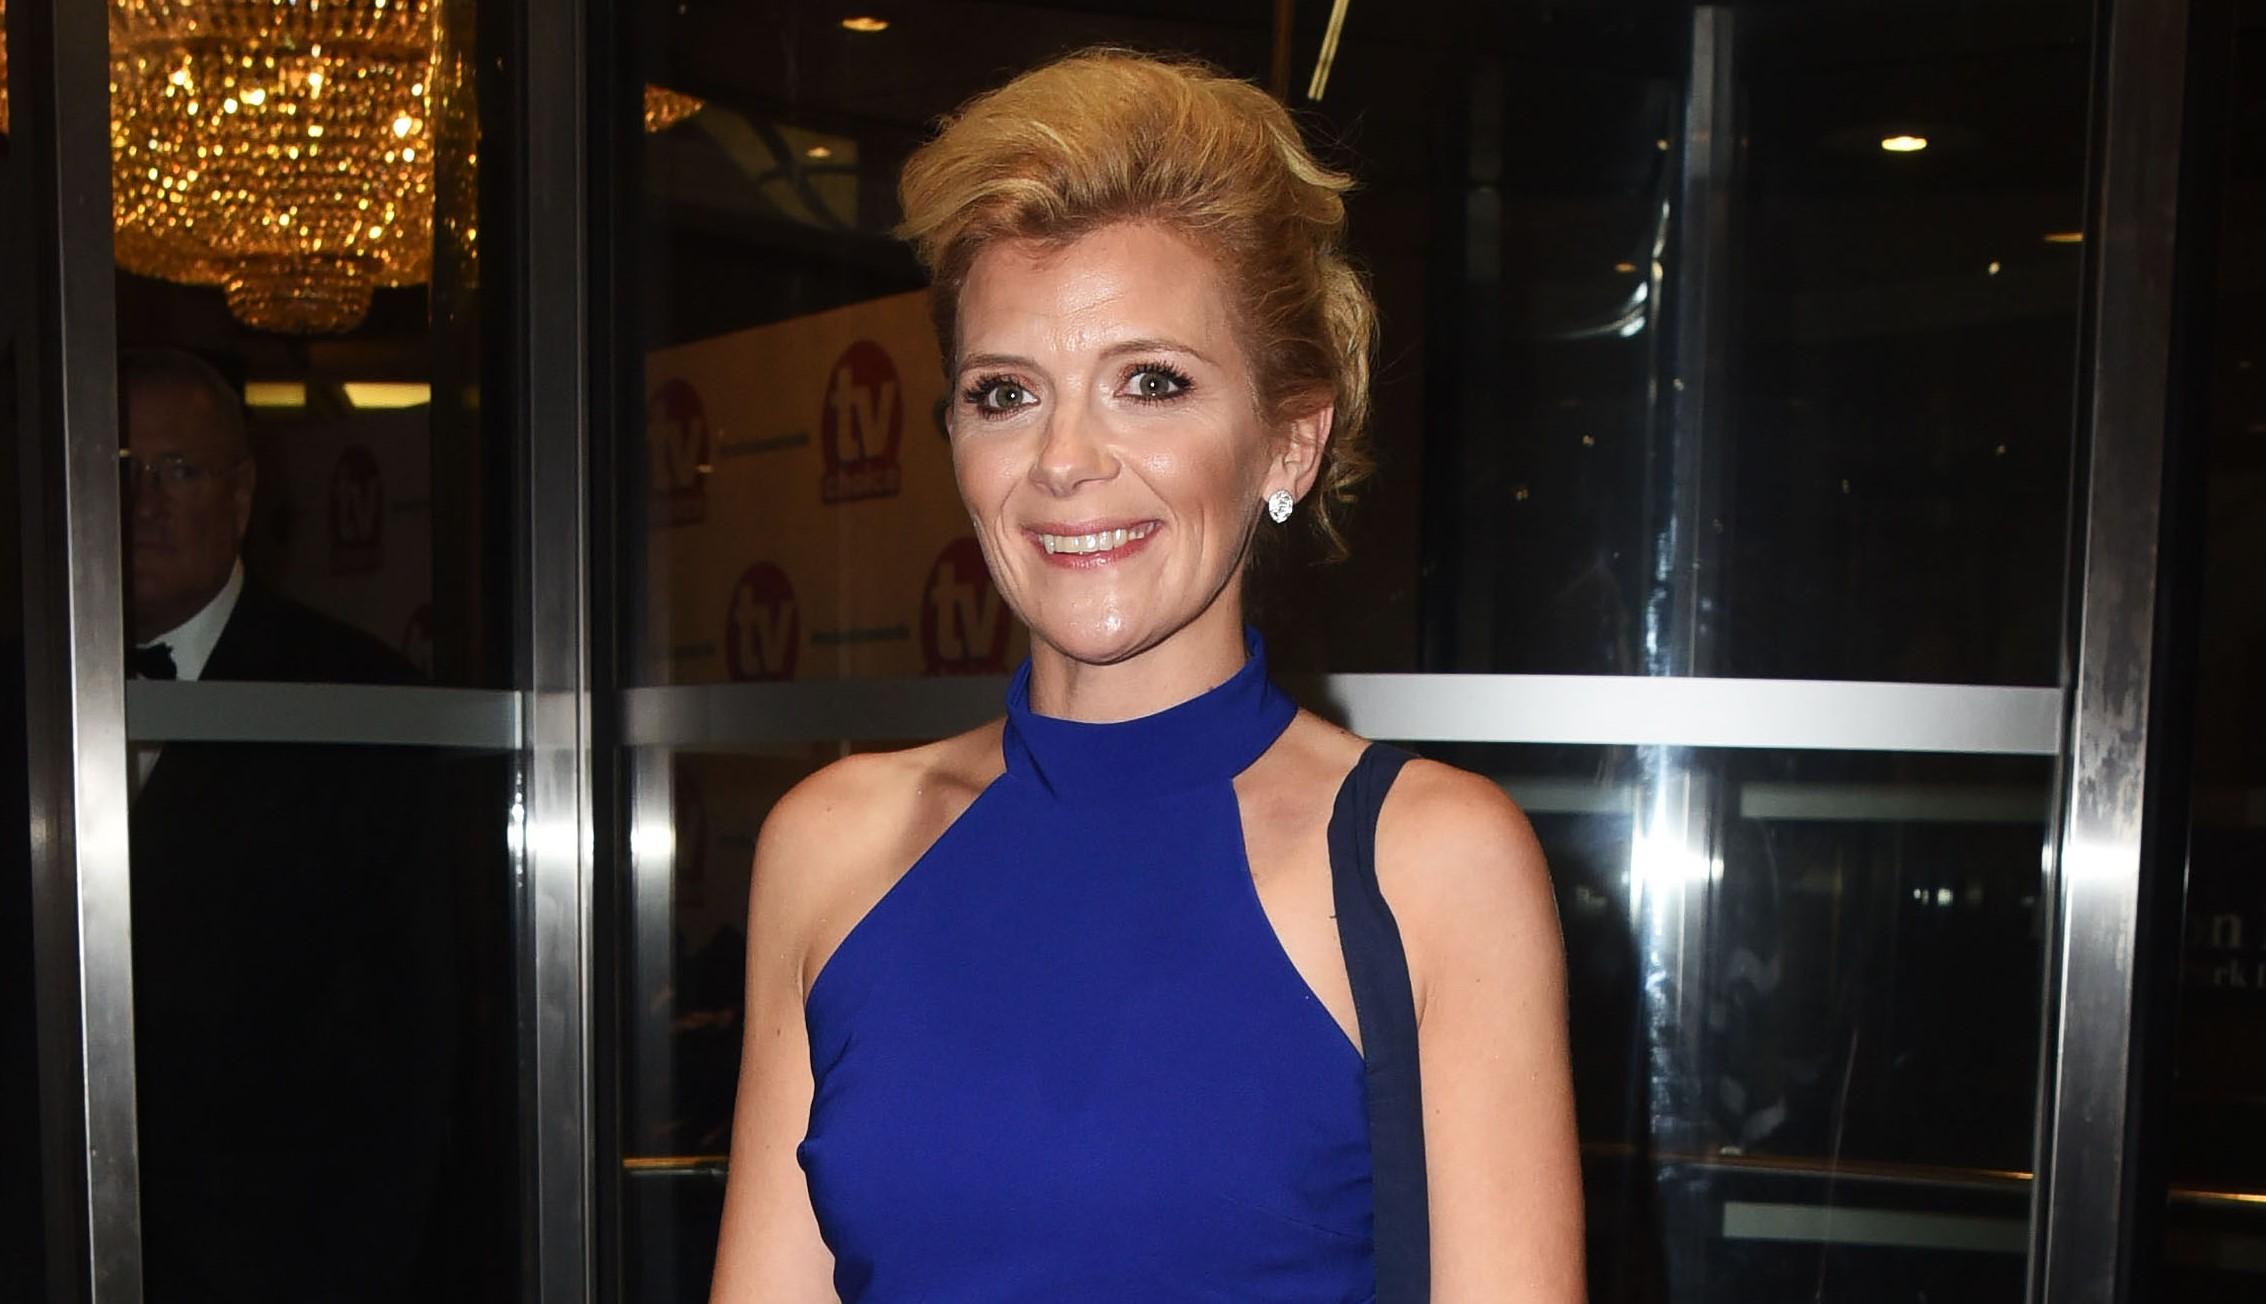 Coronation Street star Jane Danson shows off husband's hairdressing skills in lockdown